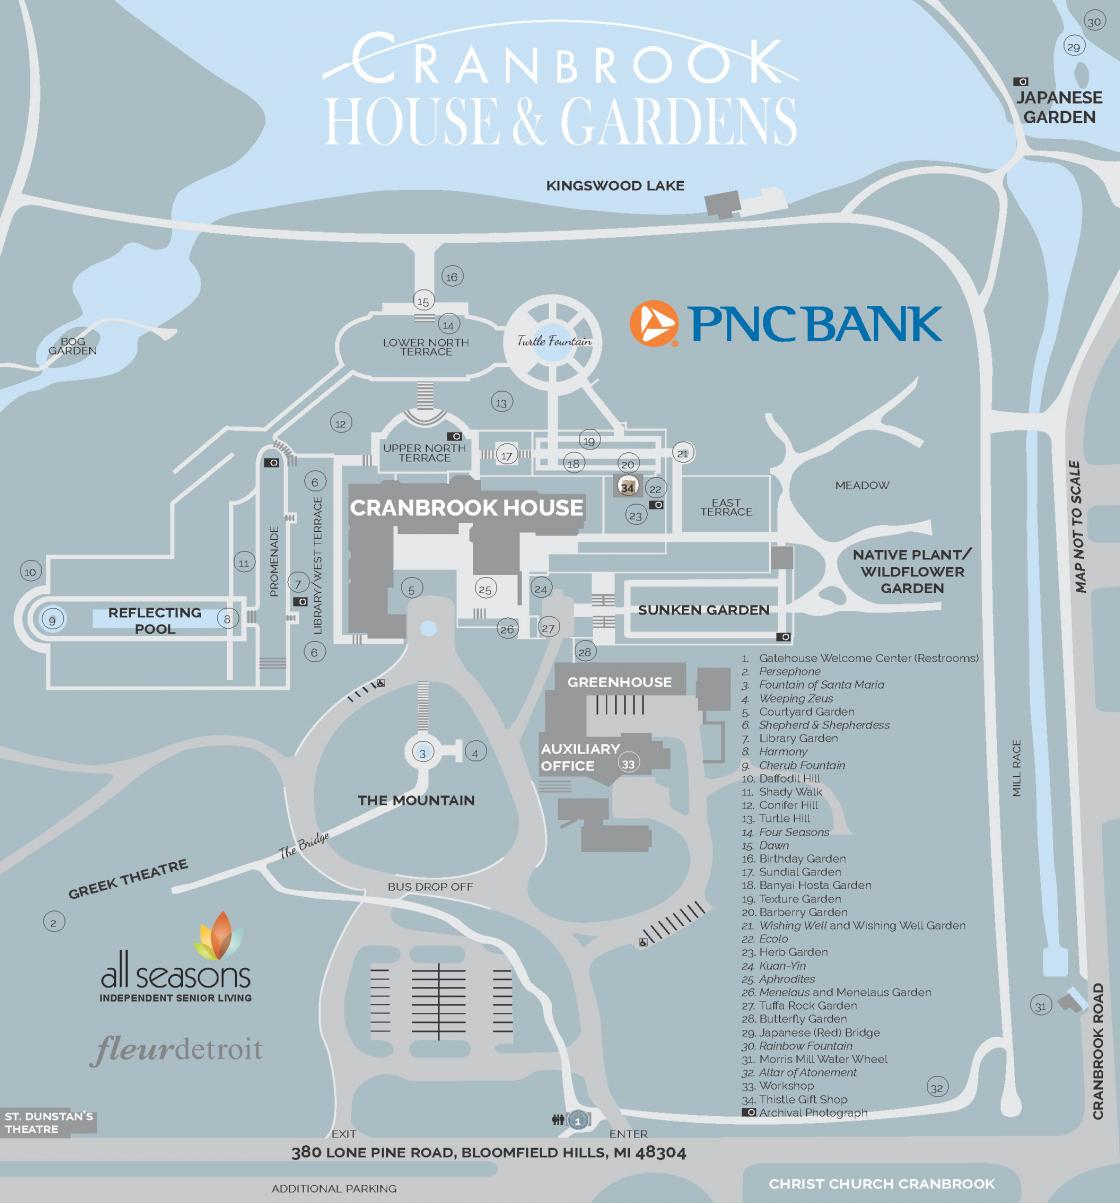 Cranbrook House & Gardens map